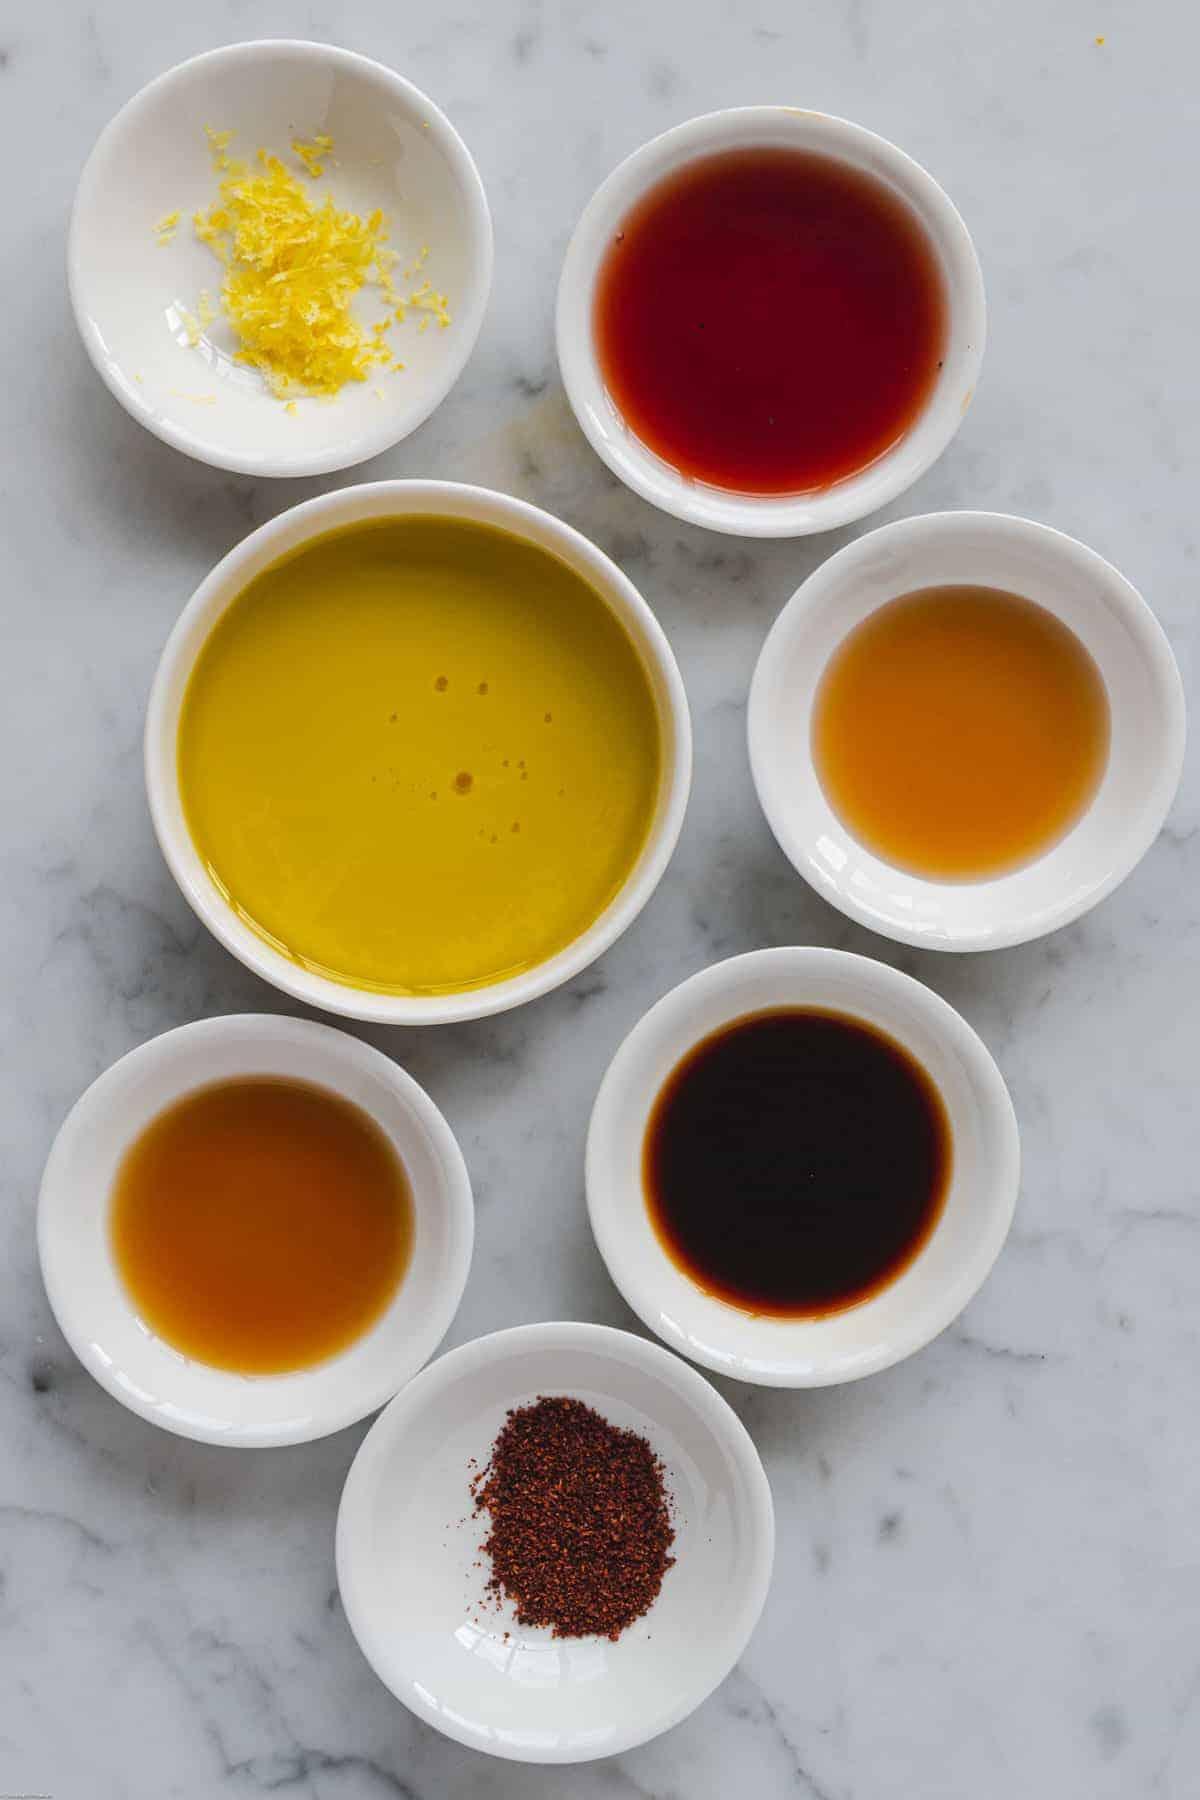 Ingredients for the salad dressing: Lemon zest, seasonings, tamari, olive oil, toasted sesame oil, balsamic vinegar, maple syrup.